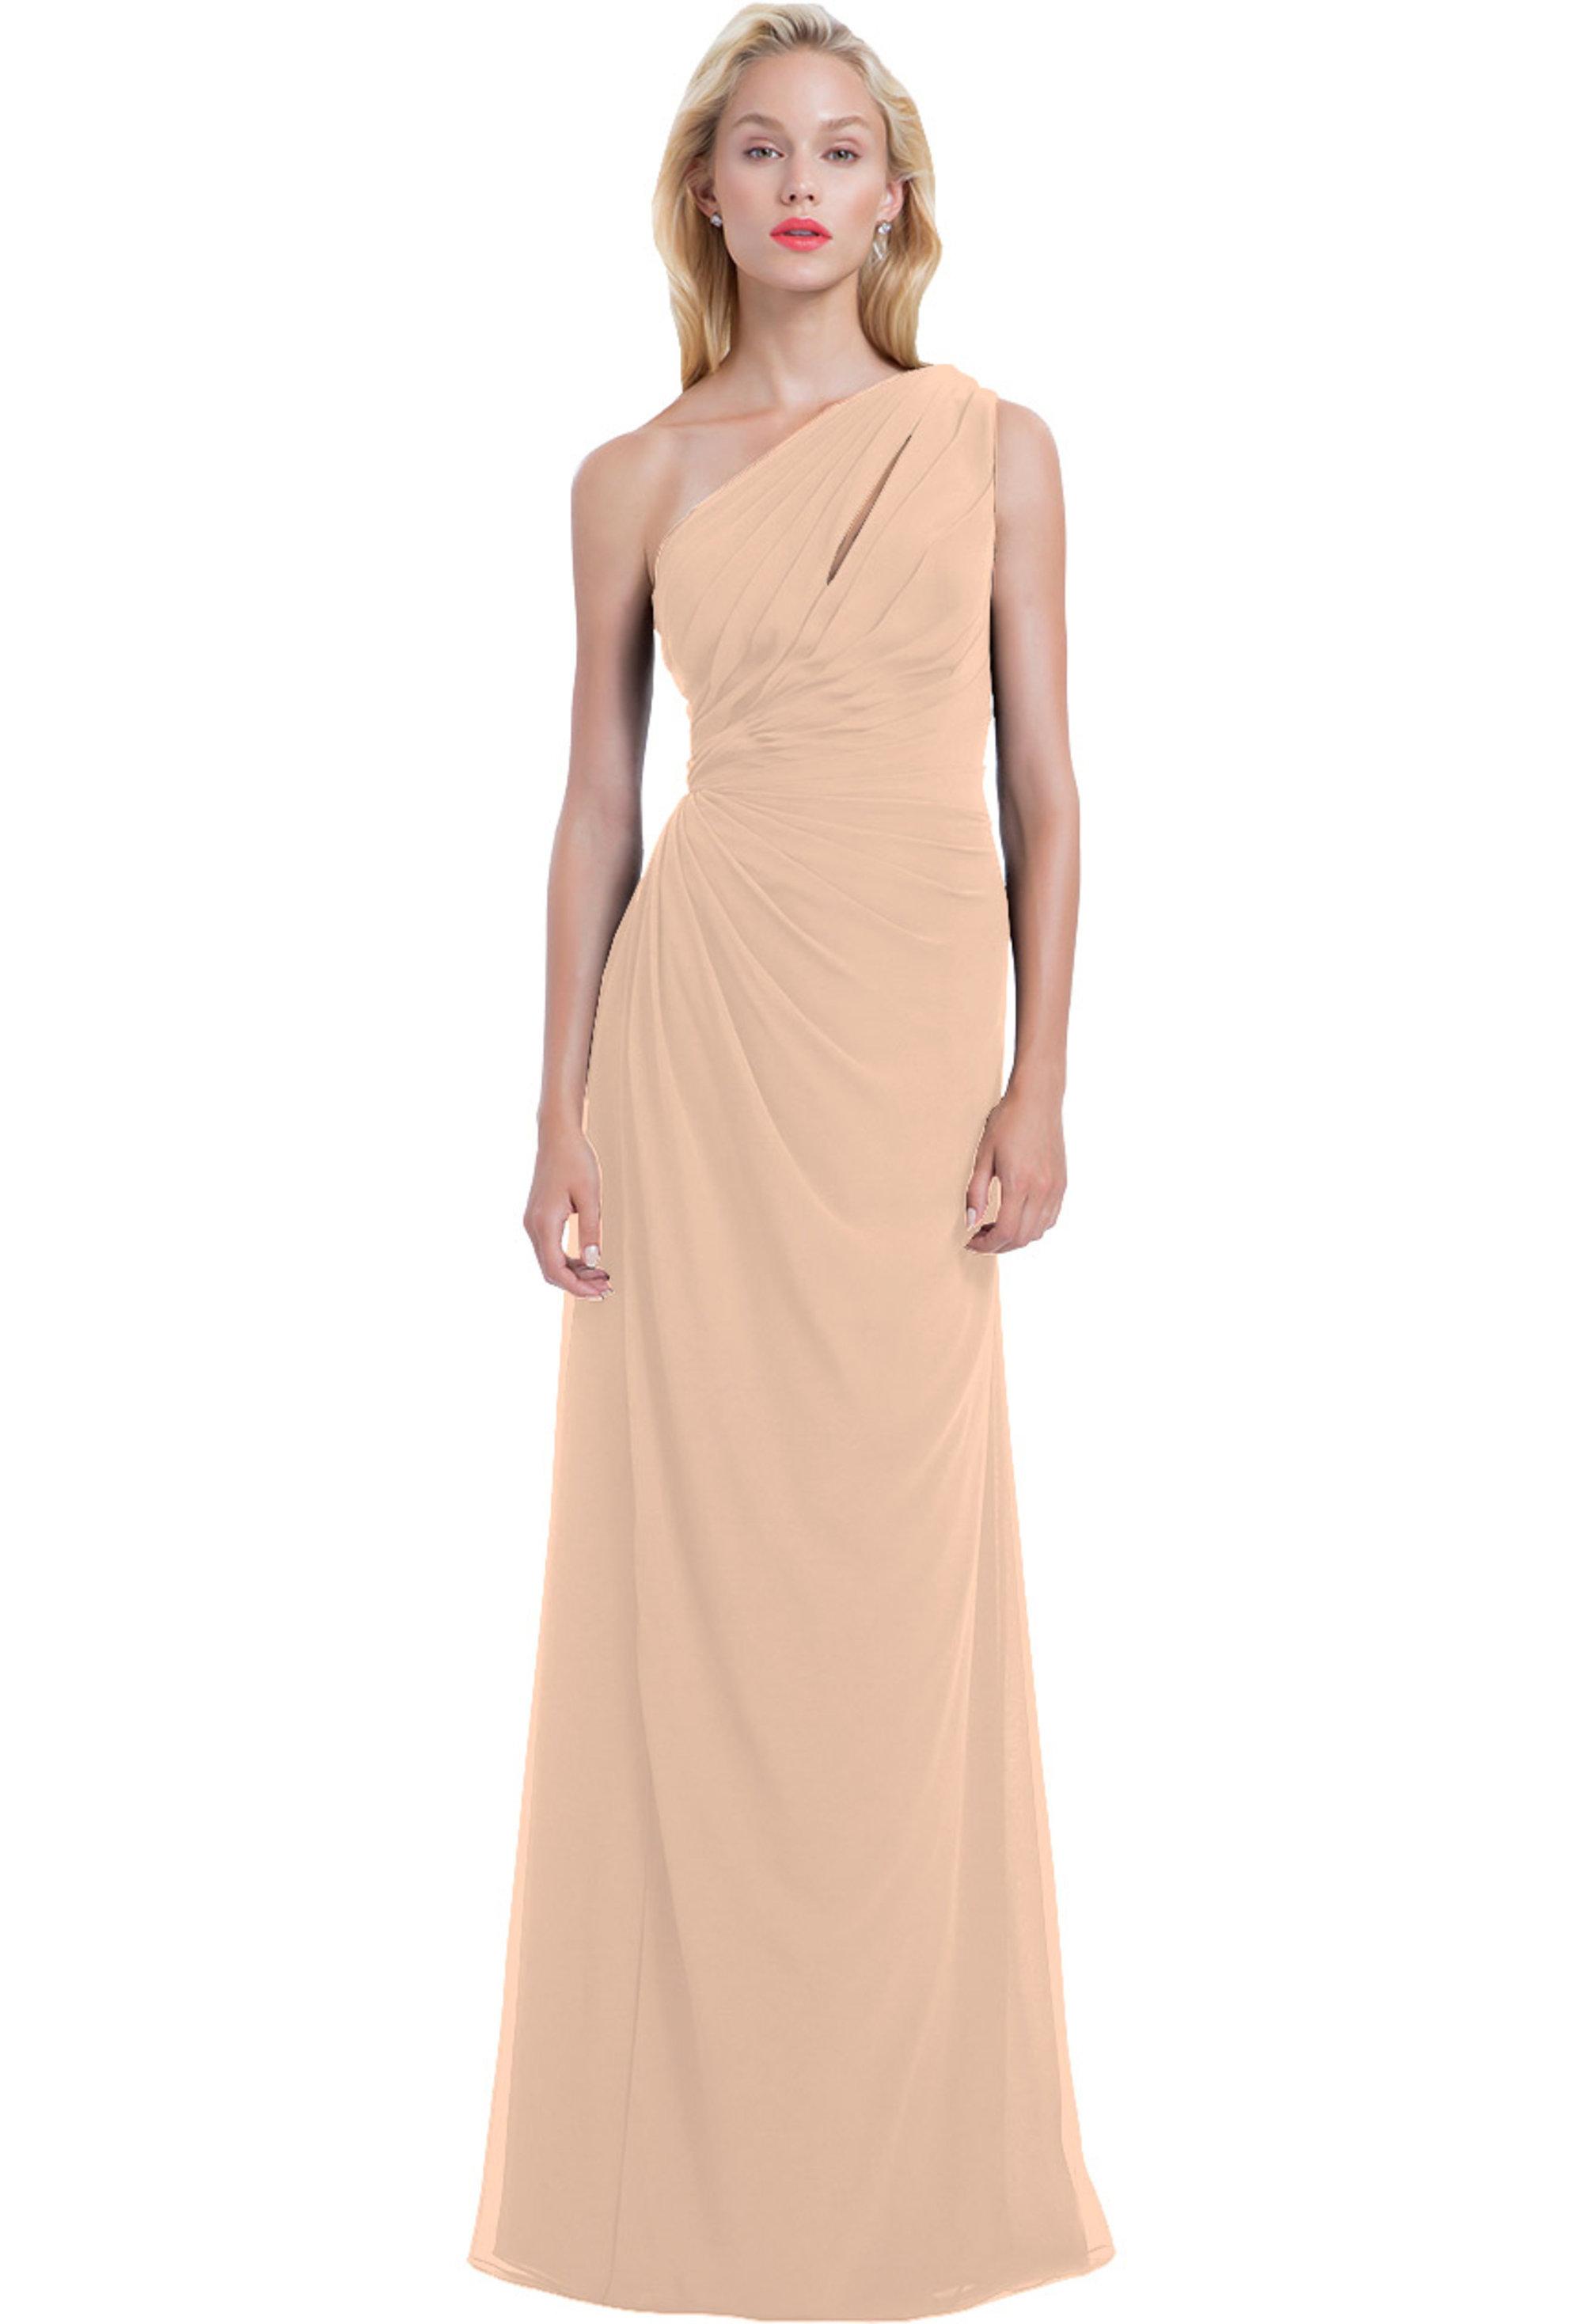 Bill Levkoff SHELL PINK Chiffon Front Cutout Asymmetrical gown, $220.00 Front